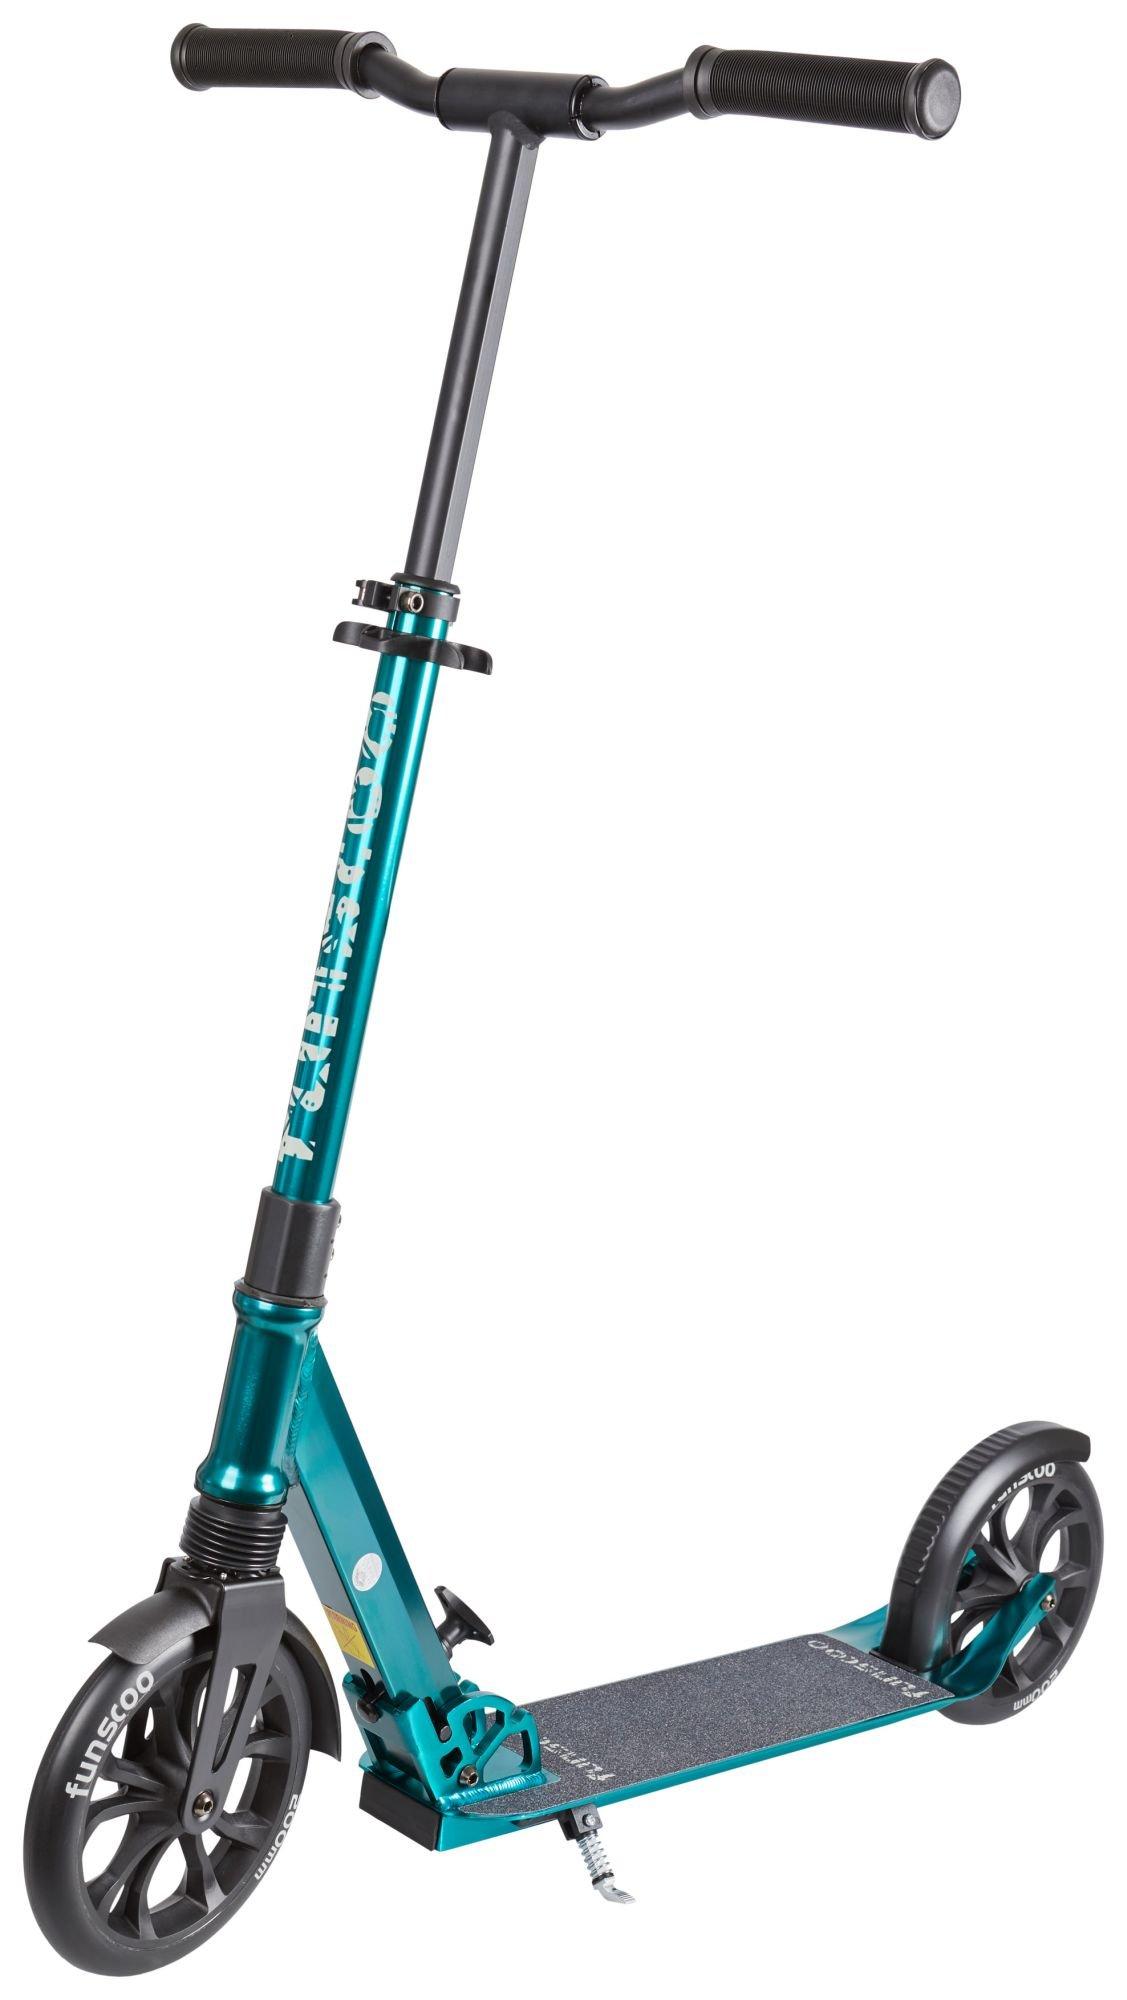 alu-skate-scooter/Kinderartikel: Funscoo funscoo Scooter +